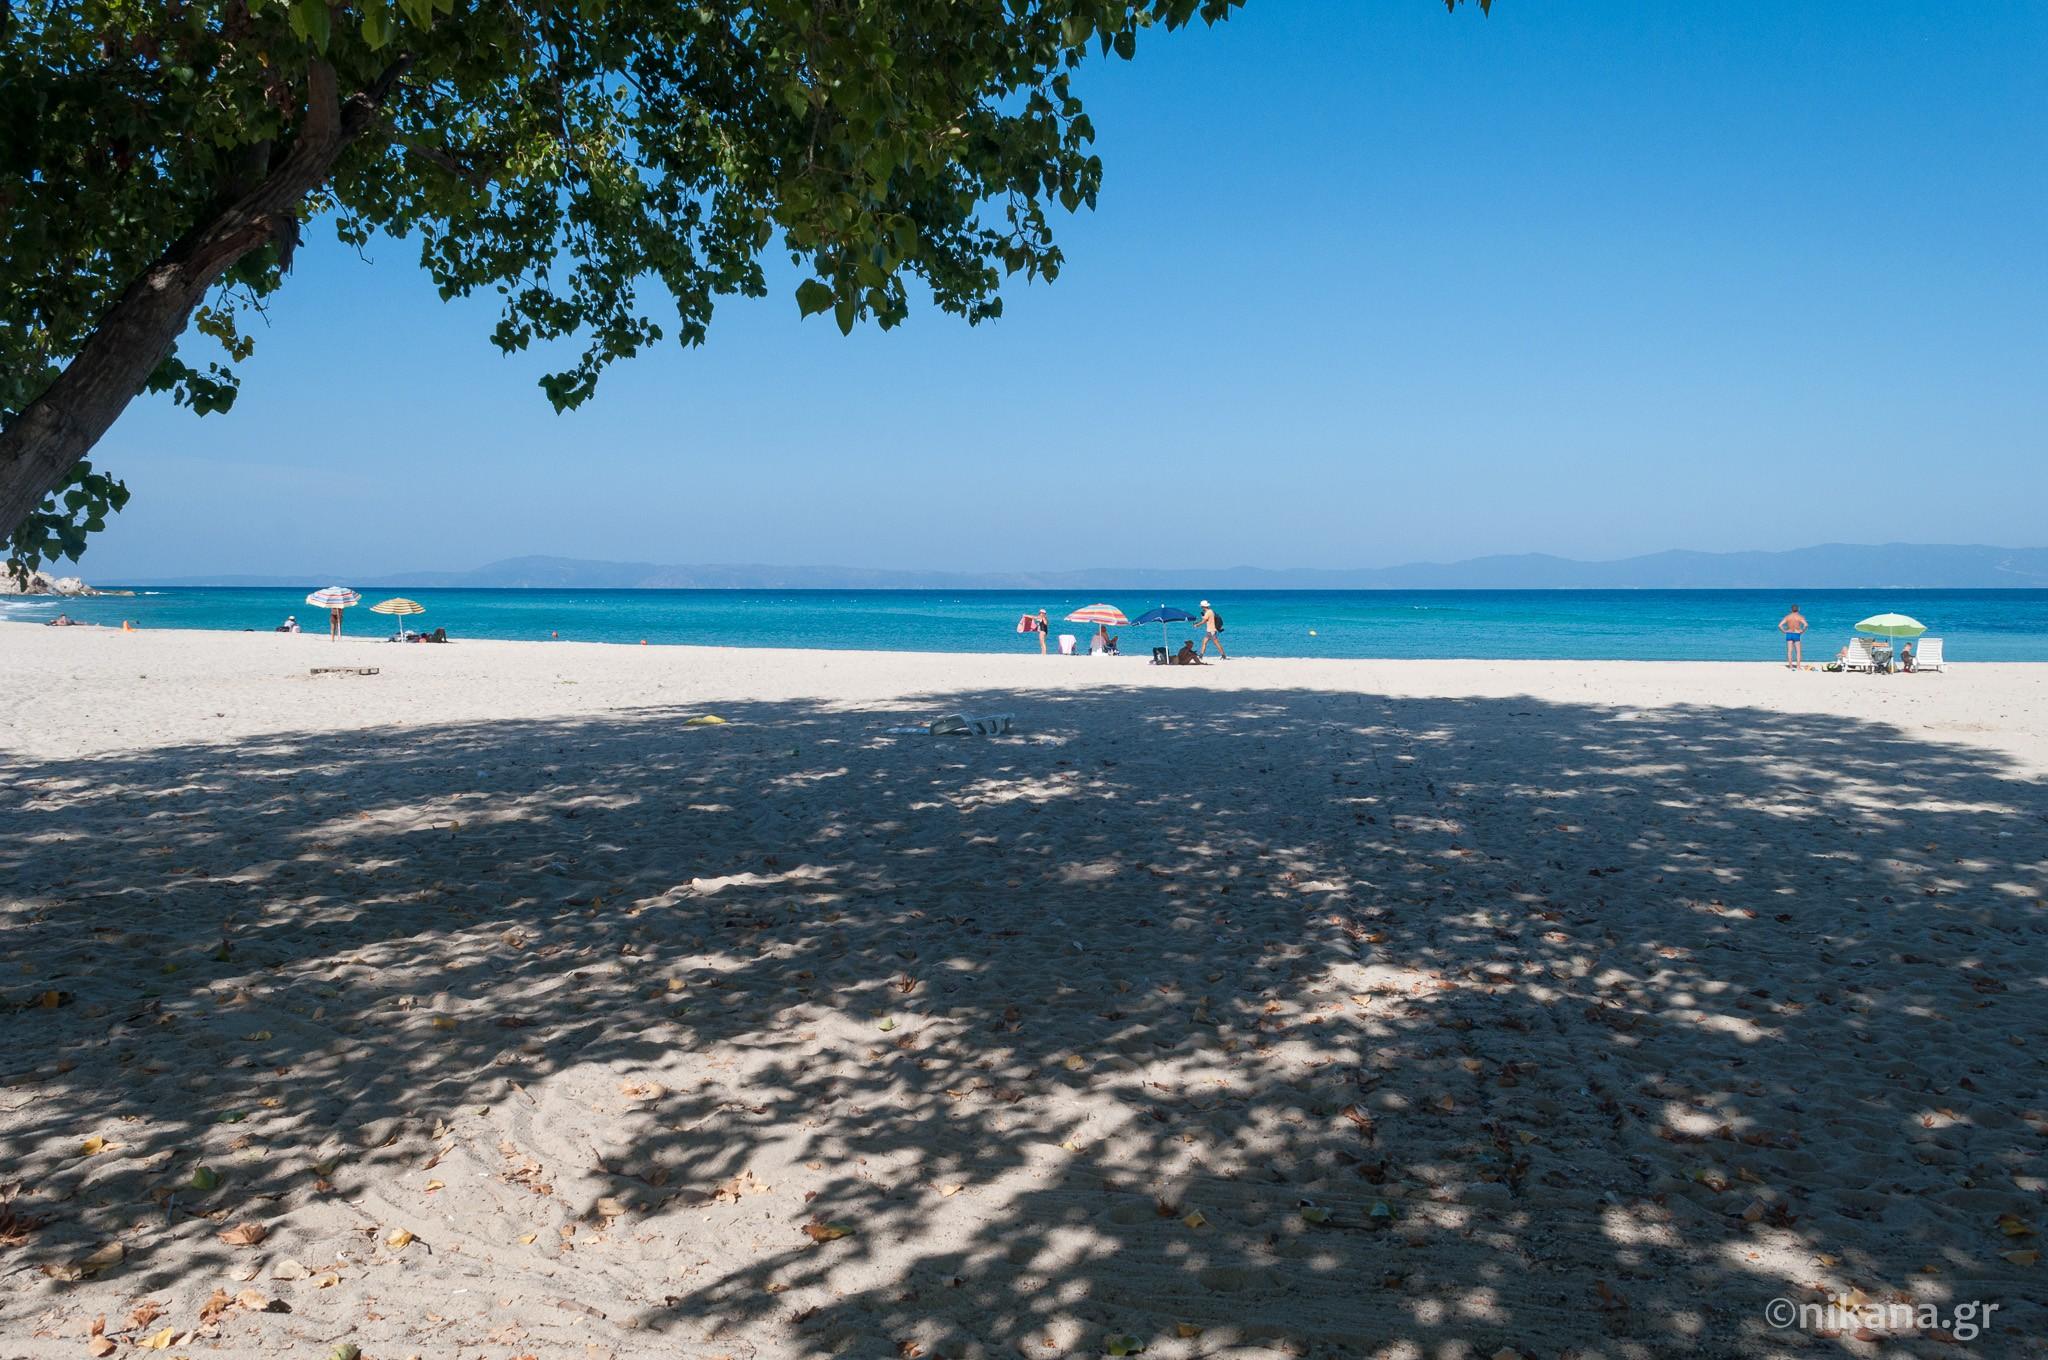 Platanitsi beach - Sithonia tourist guide - Nikana.gr